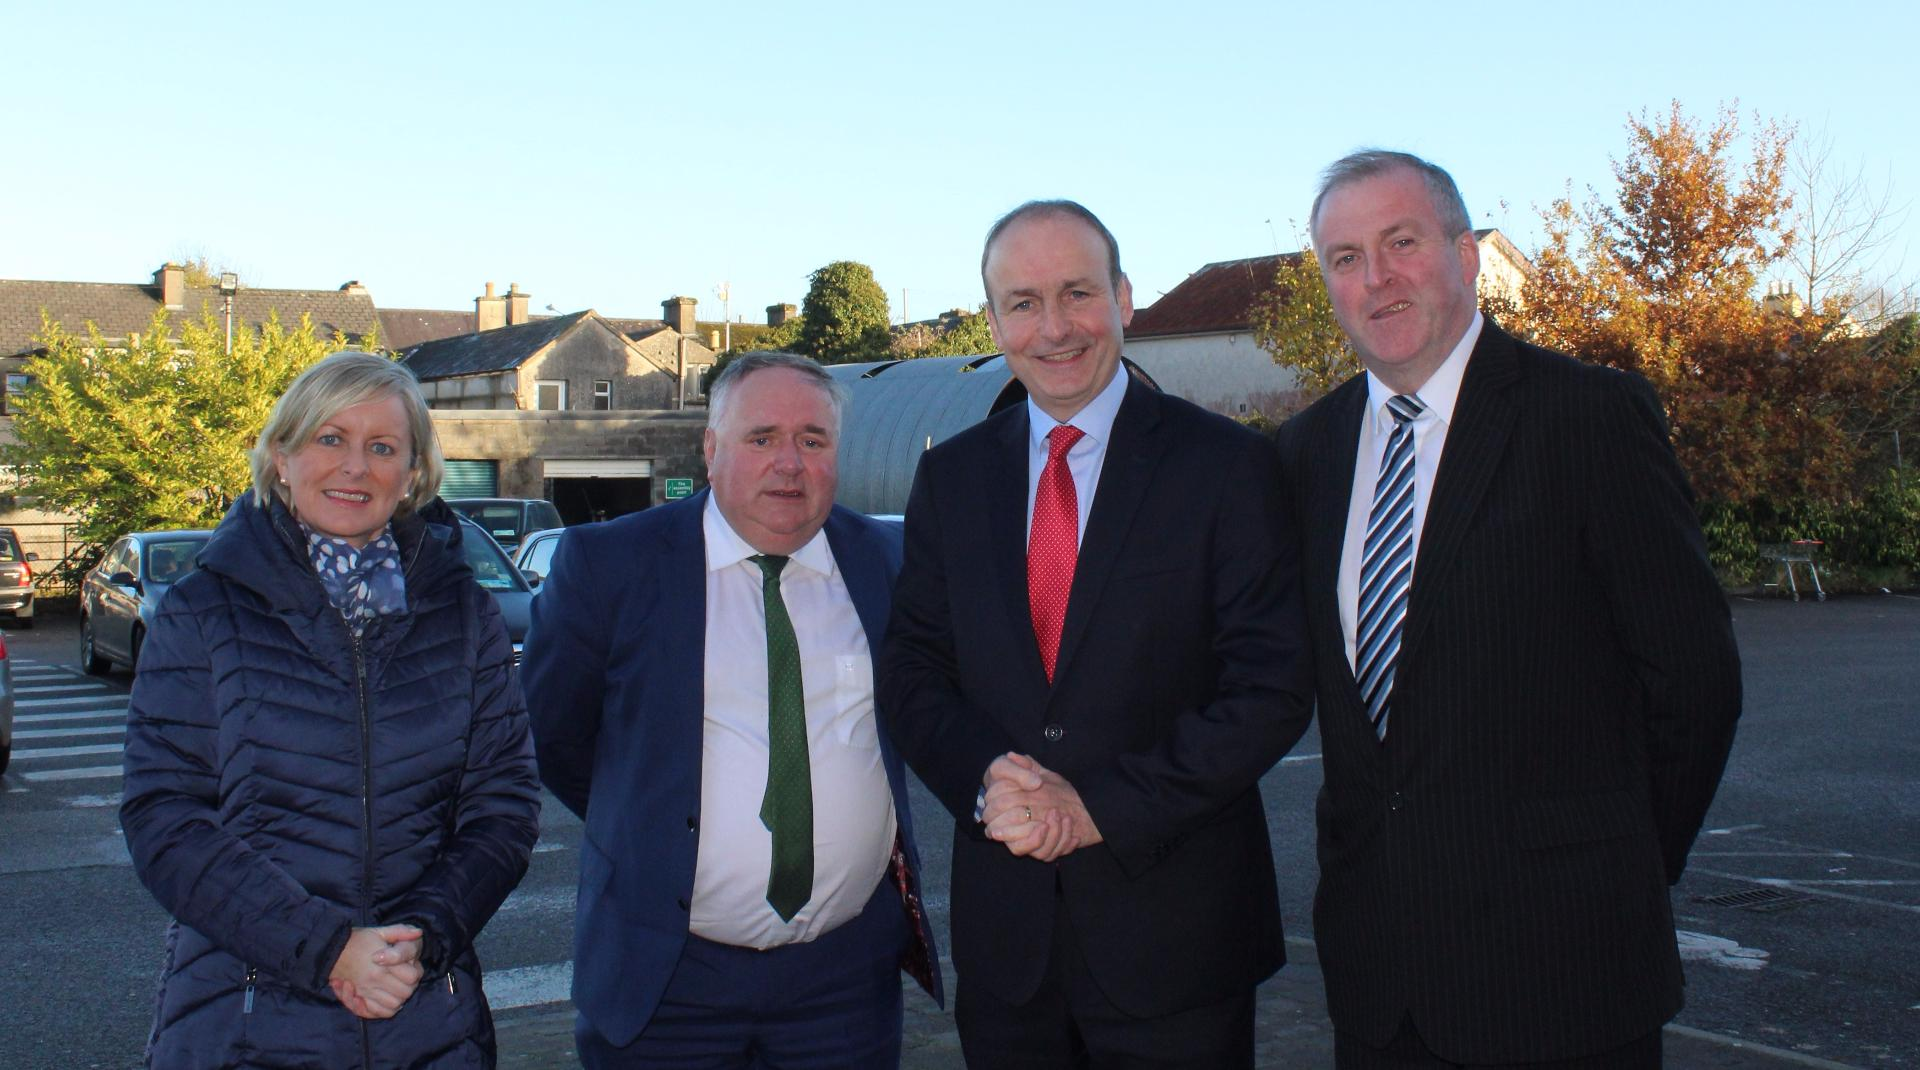 Photo of Fianna Fail leader visits Boyle